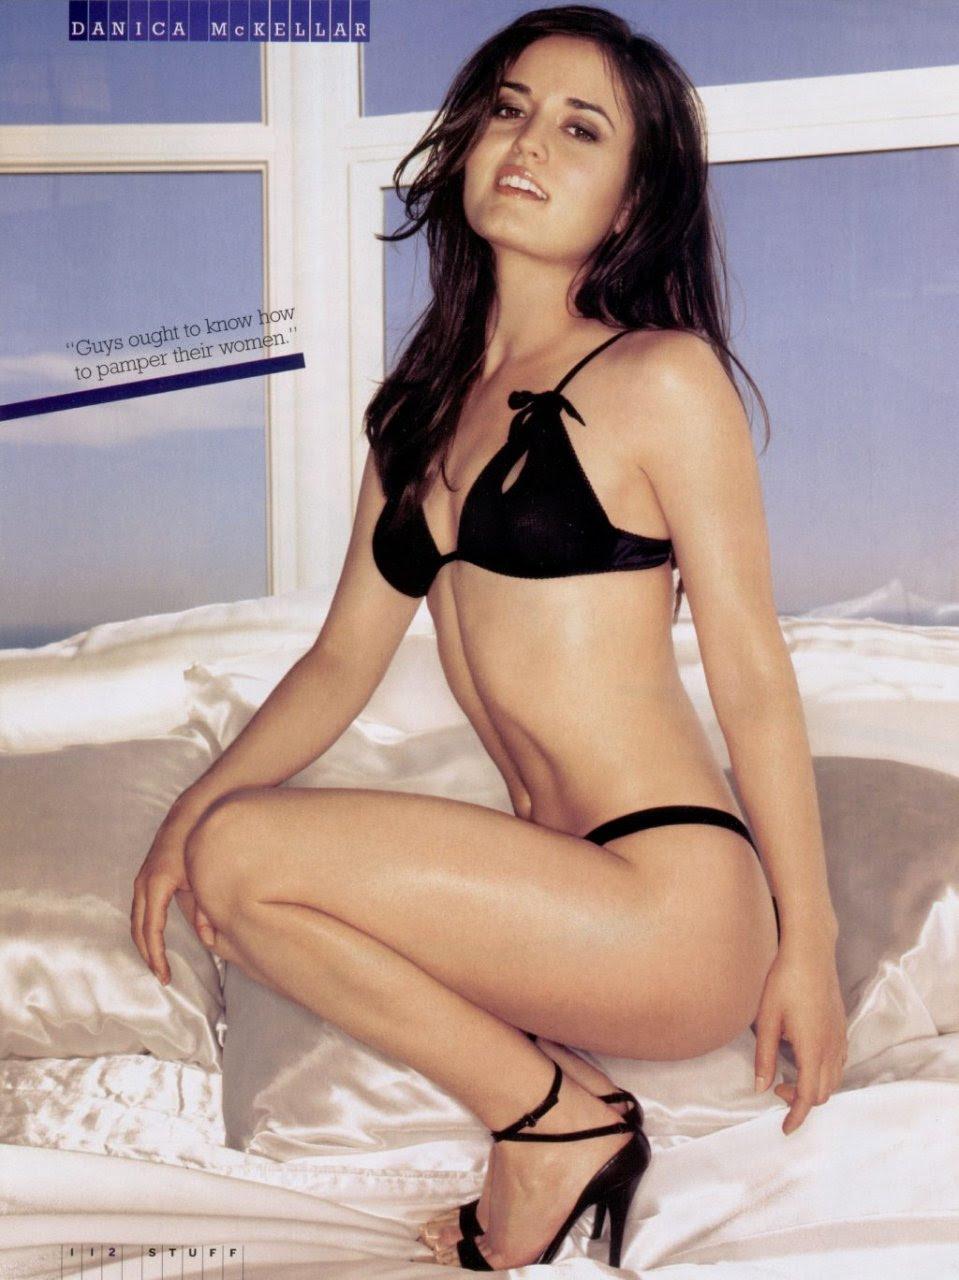 Danica Mckellar Sexy Pictures